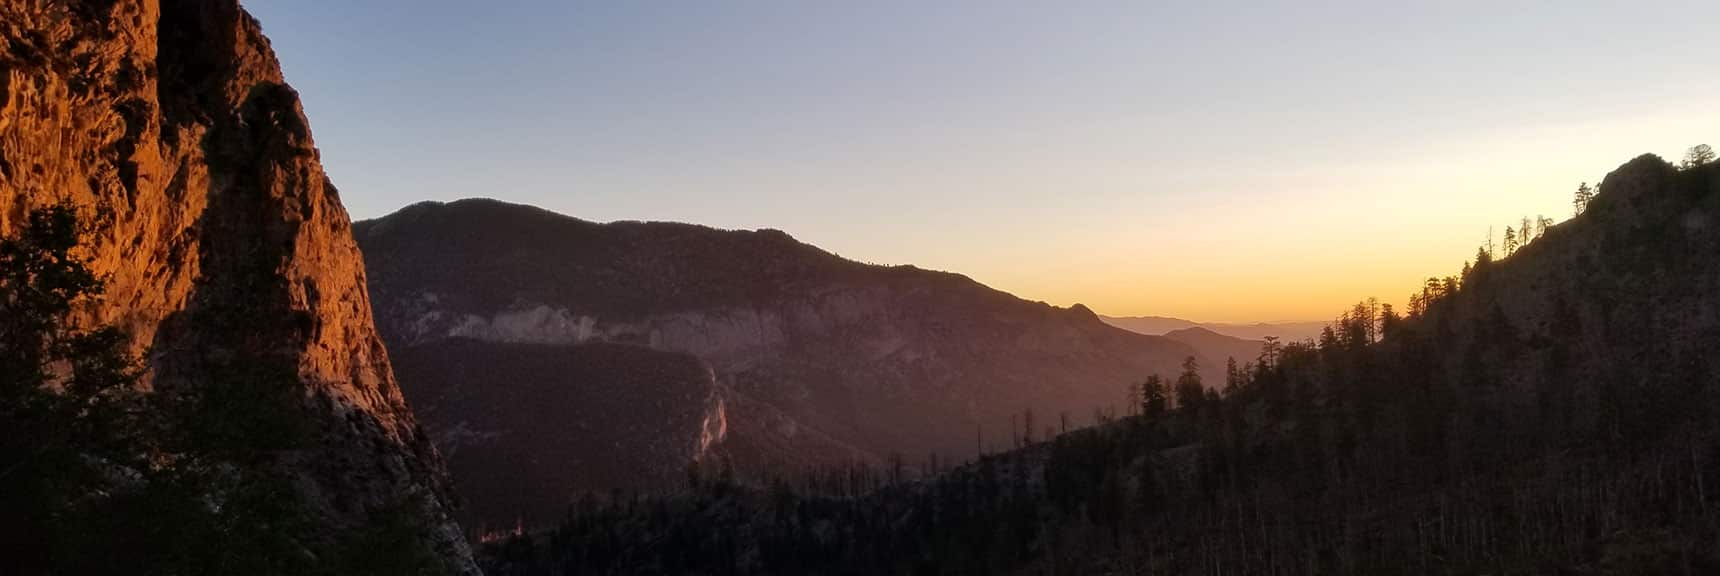 Sunrise on the Charleston Wilderness South Climb Trail in Nevada